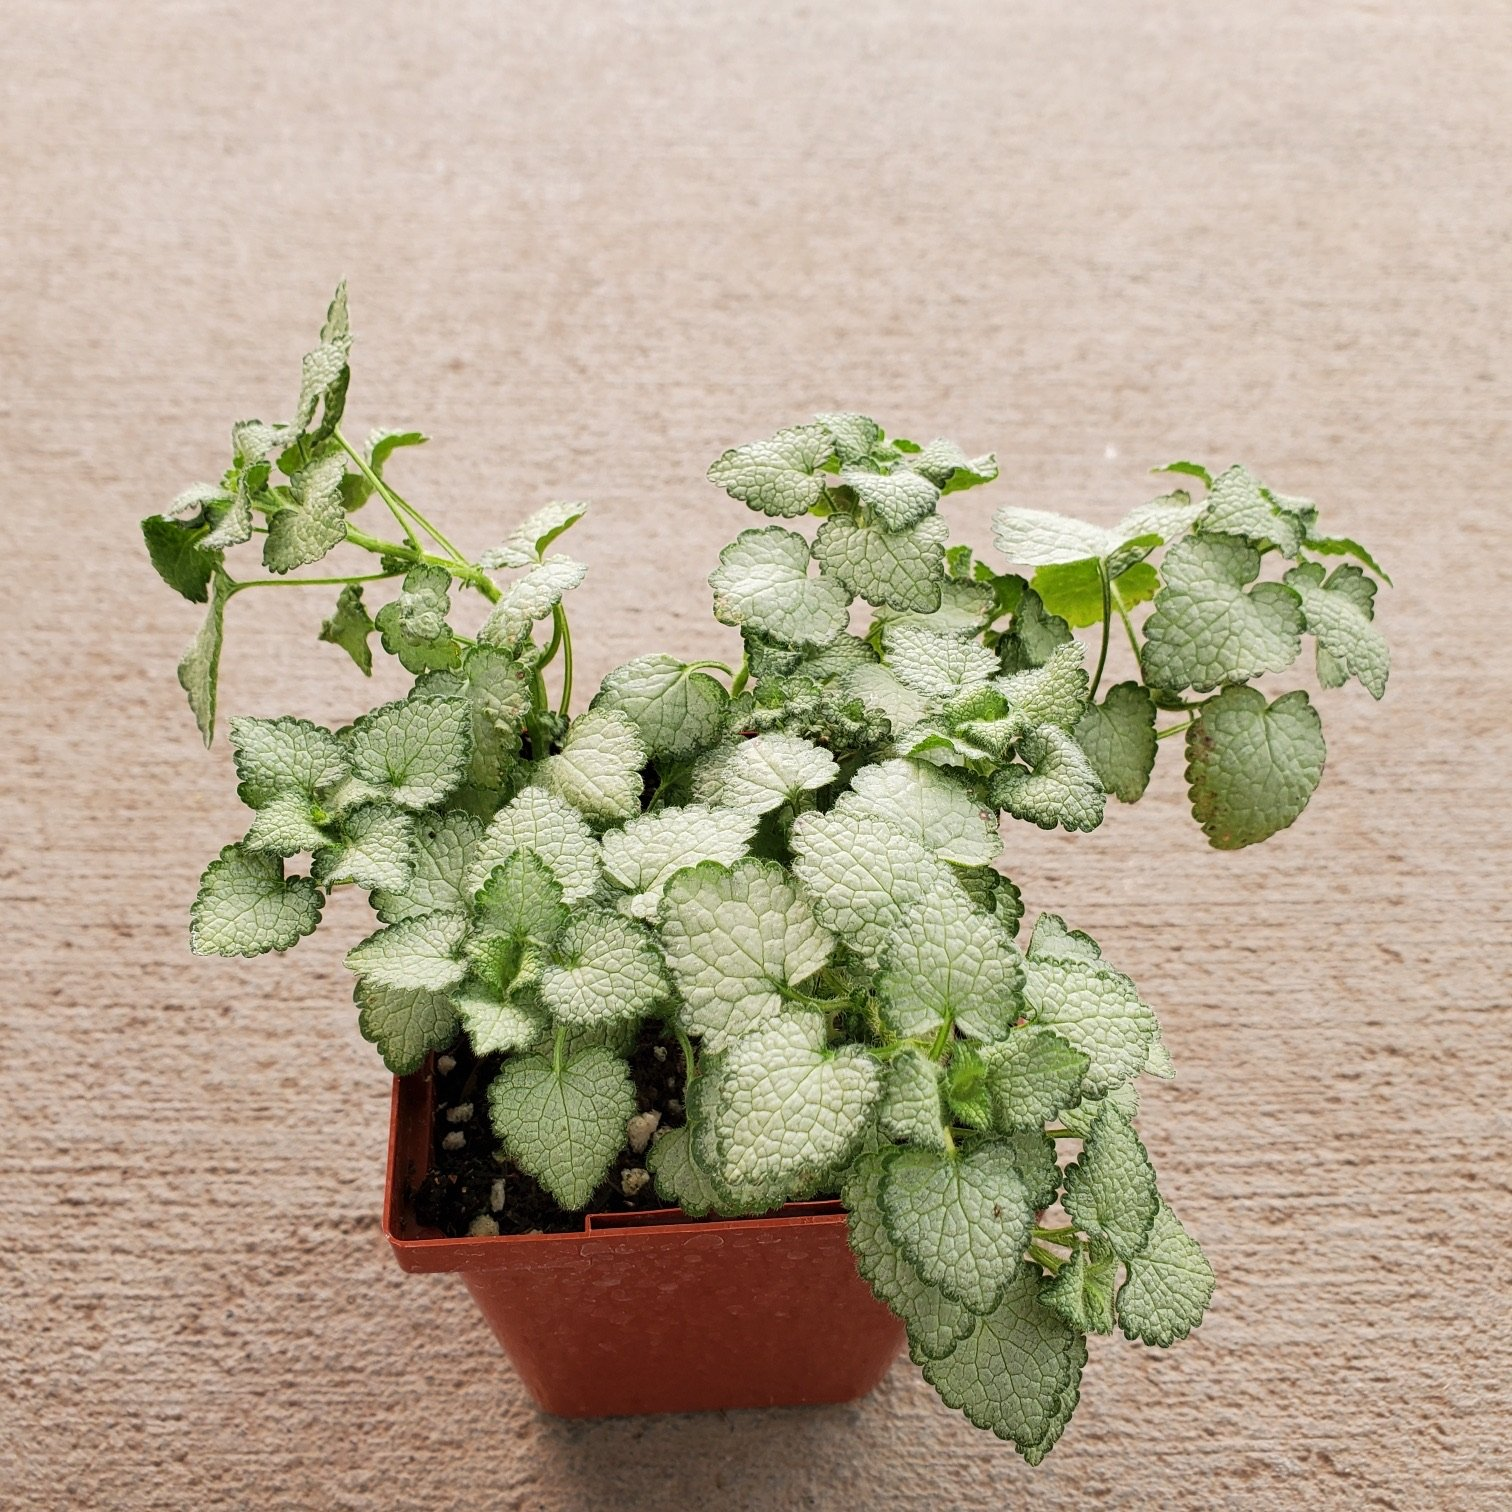 Lamium Maculatum Deadnettle houseplant